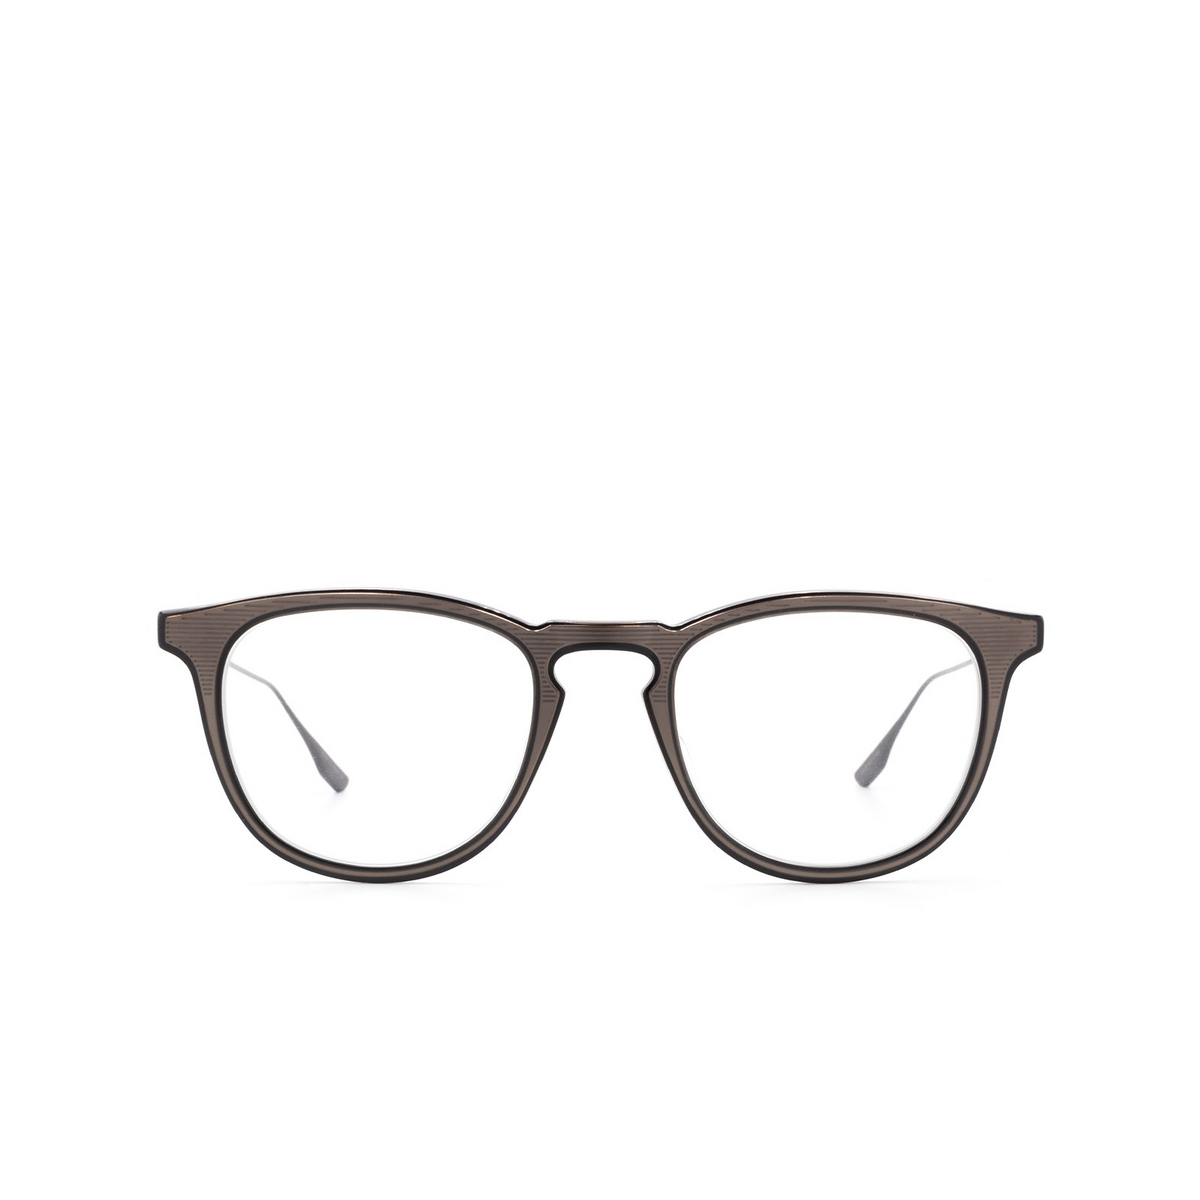 Dita® Square Eyeglasses: DTX105 color Blk-blk.